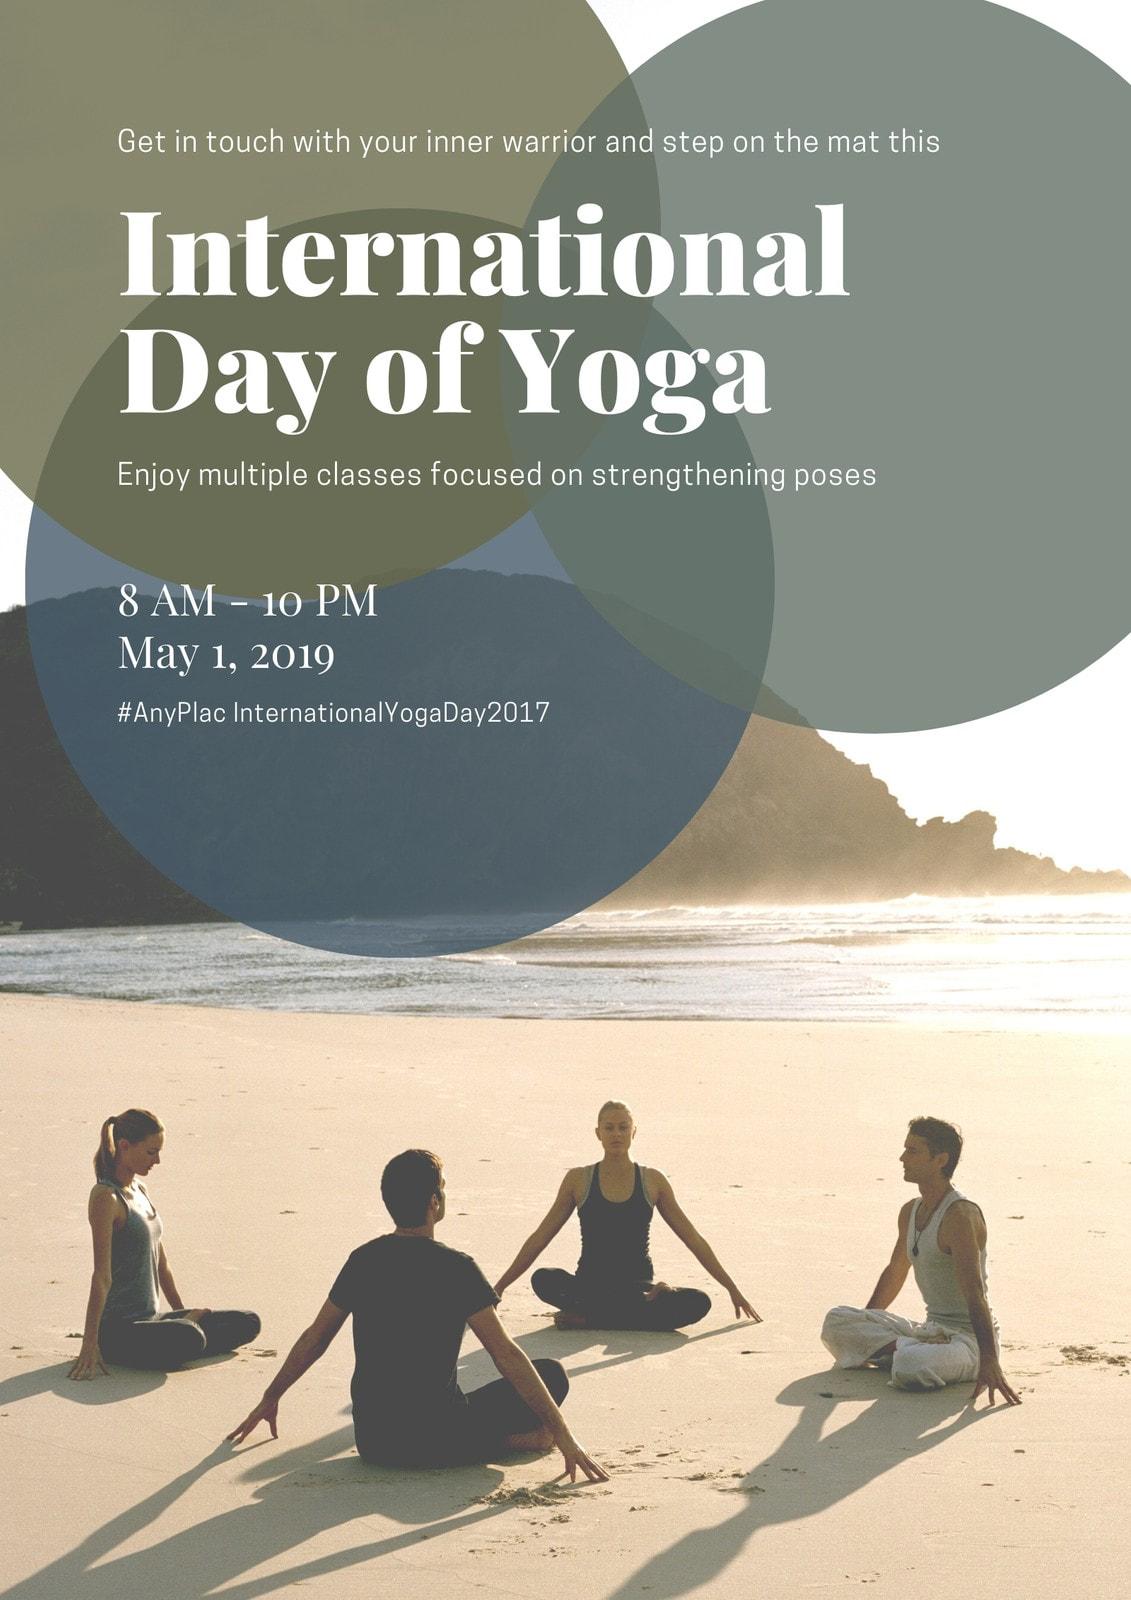 Green Beach International Day Of Yoga Poster